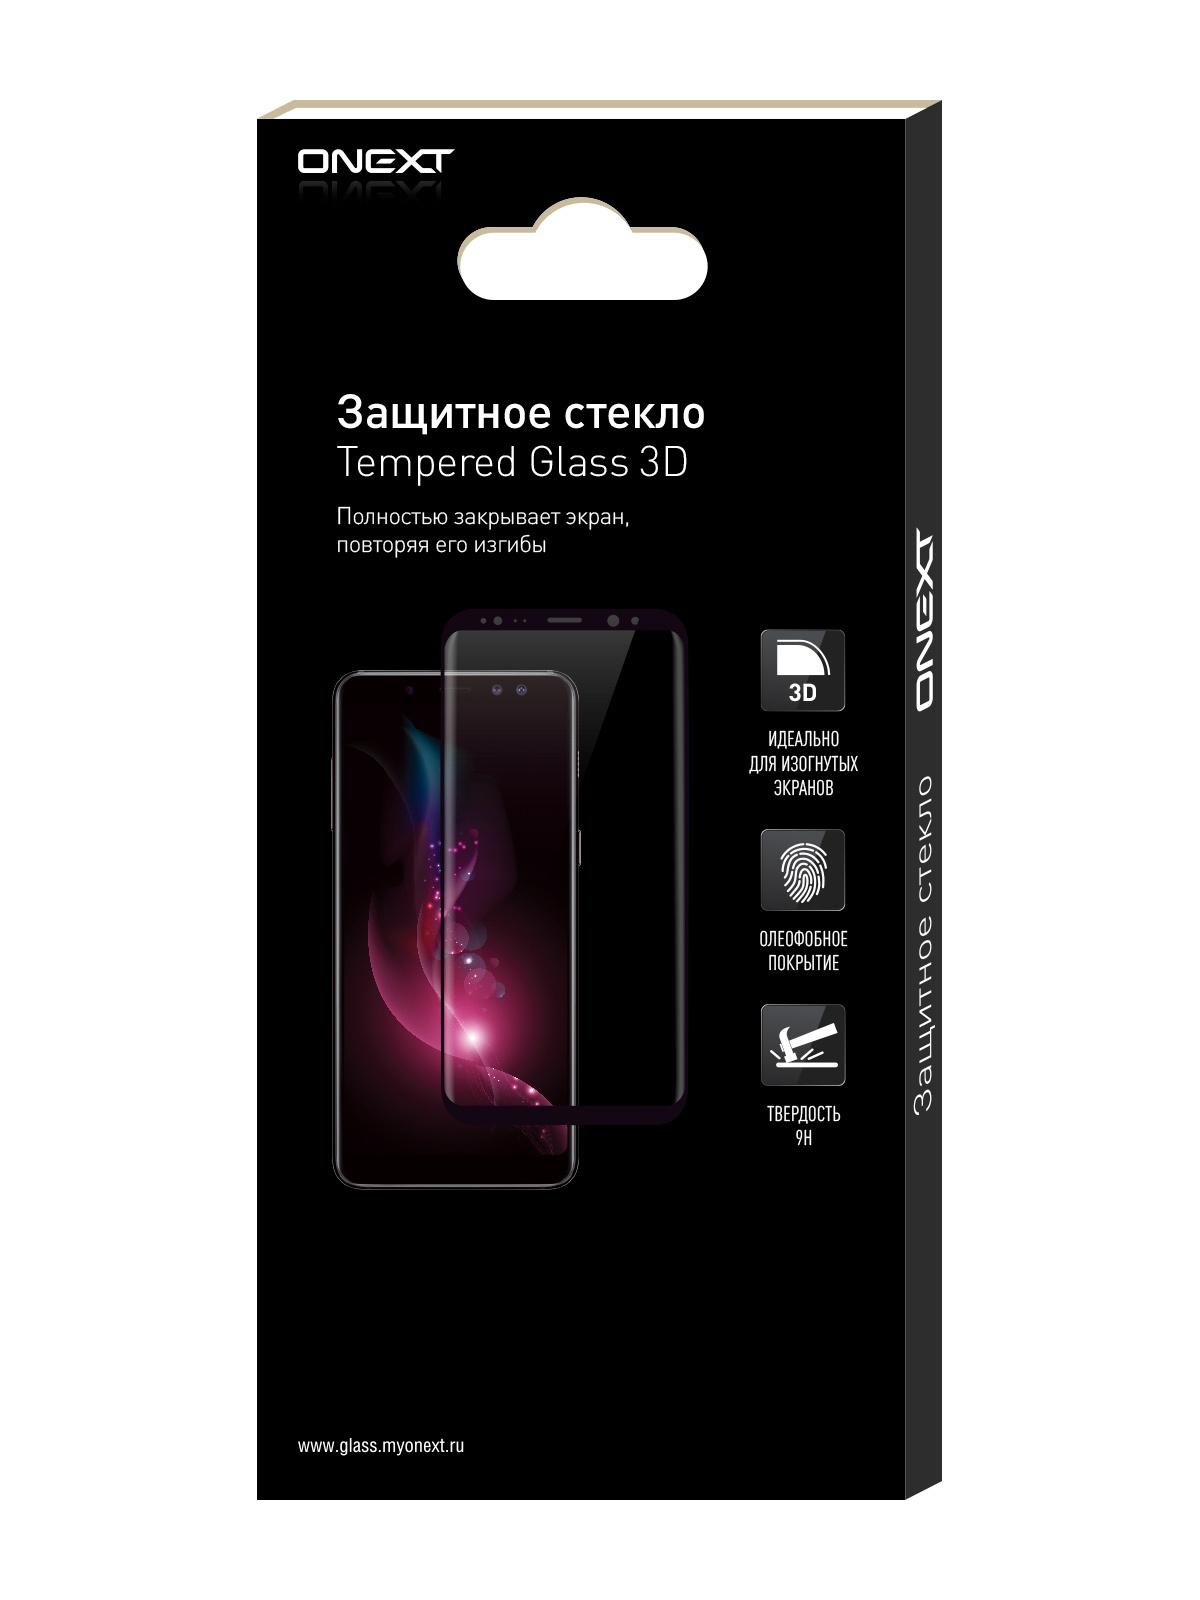 цена на Защитное стекло ONEXT Xiaomi Redmi Note 4 3D